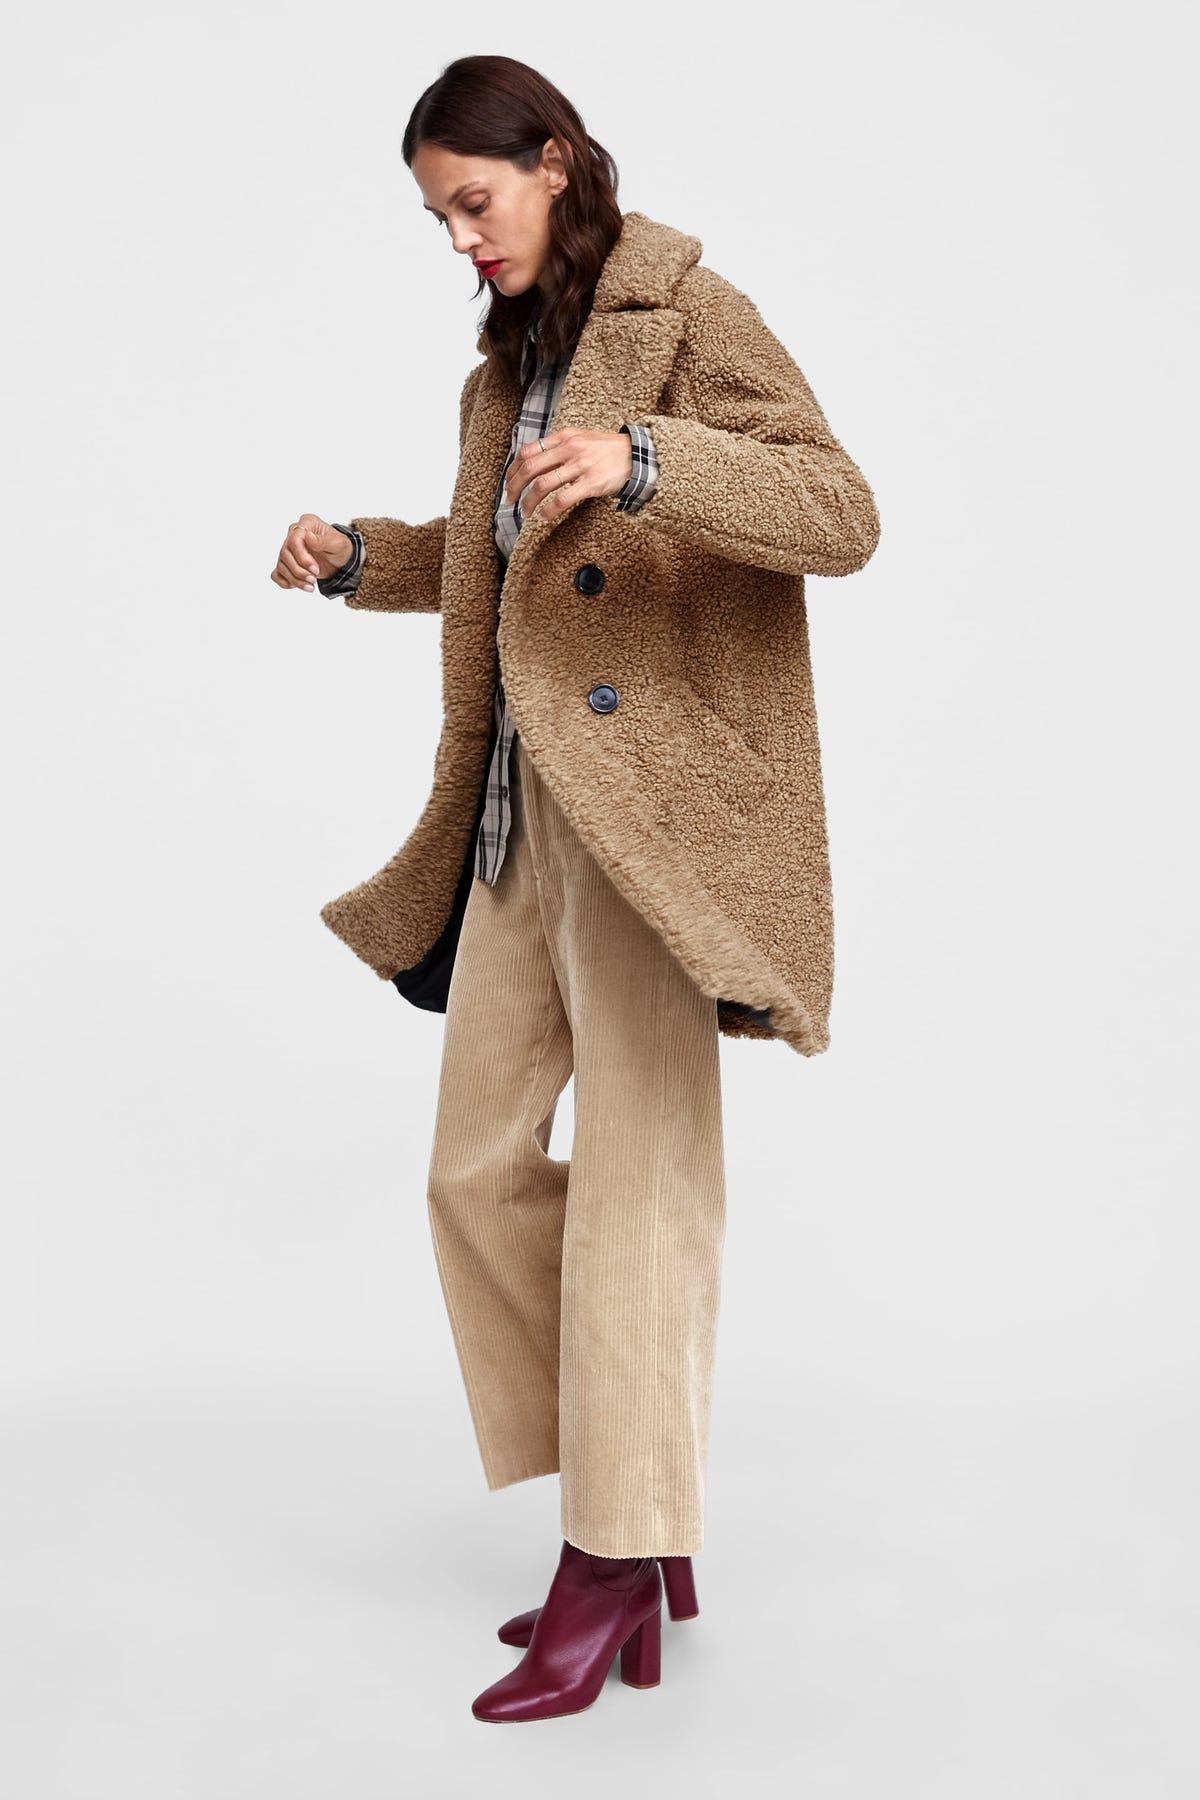 e1f2c298e1 Best Zara Winter Coats 2018: Womens Fur, Puffers & More